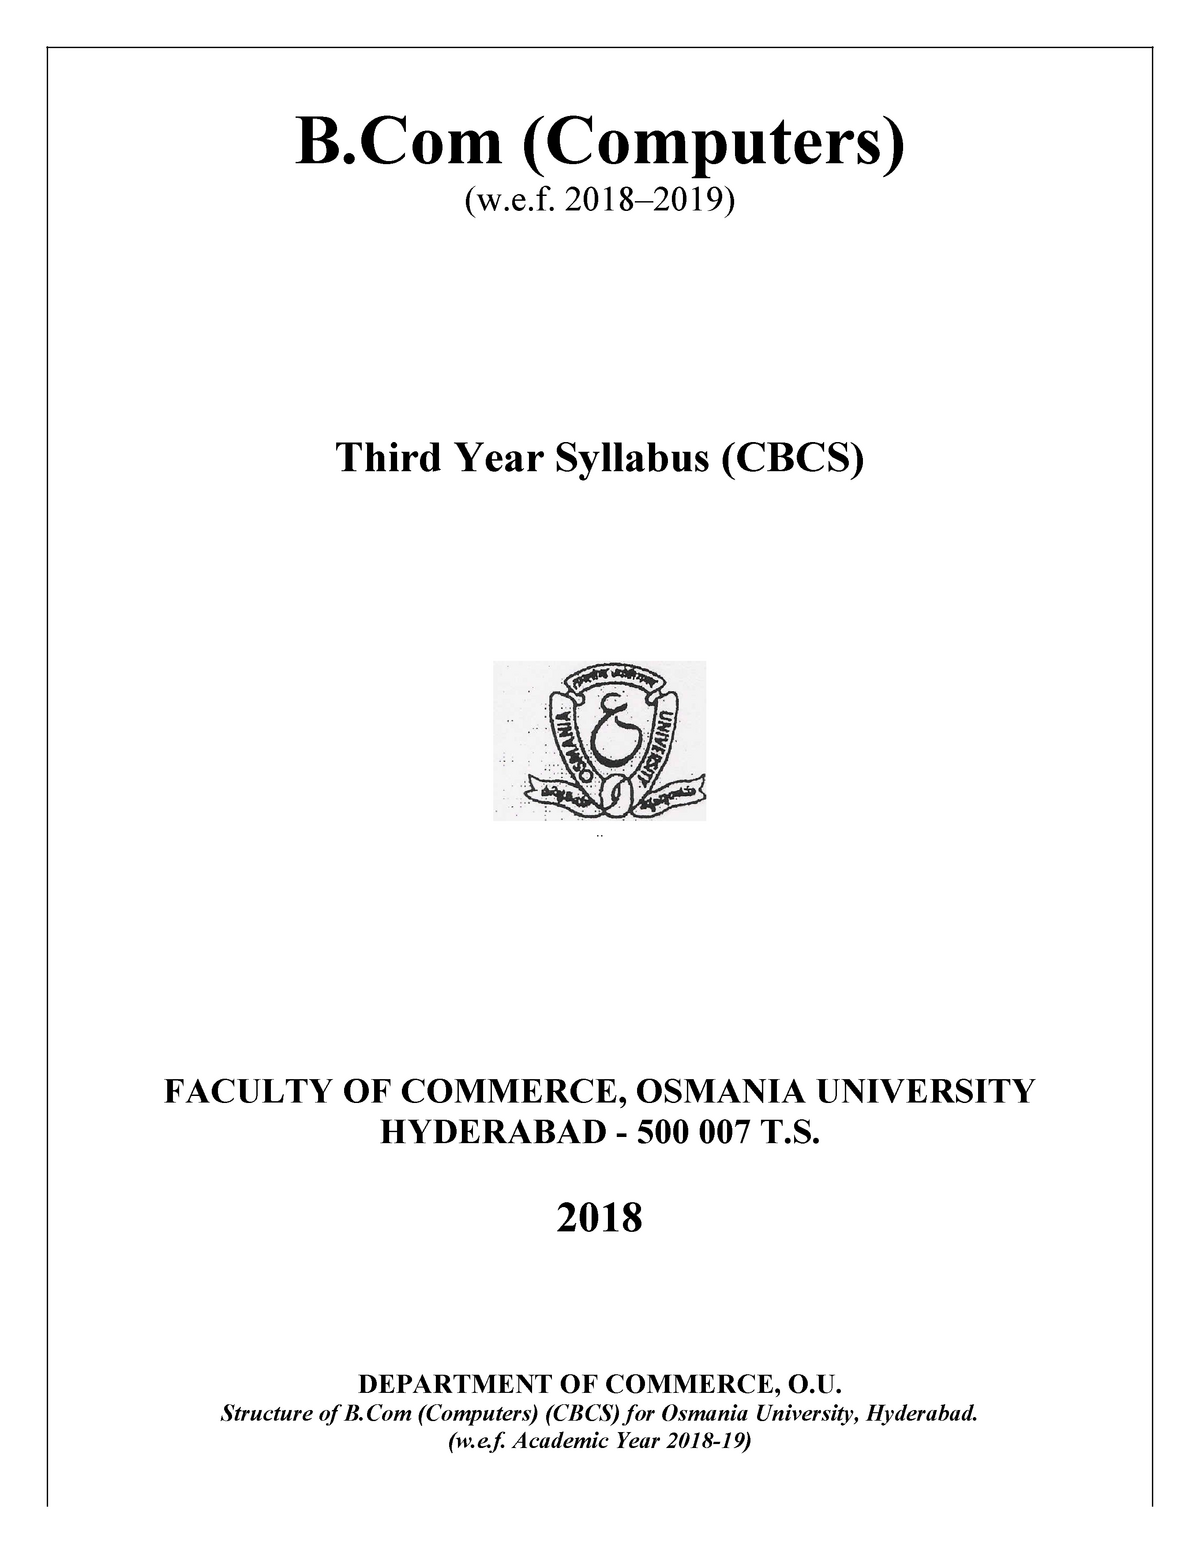 2  B Com Computers - 402: Bachelor of commerce (computers) - StuDocu